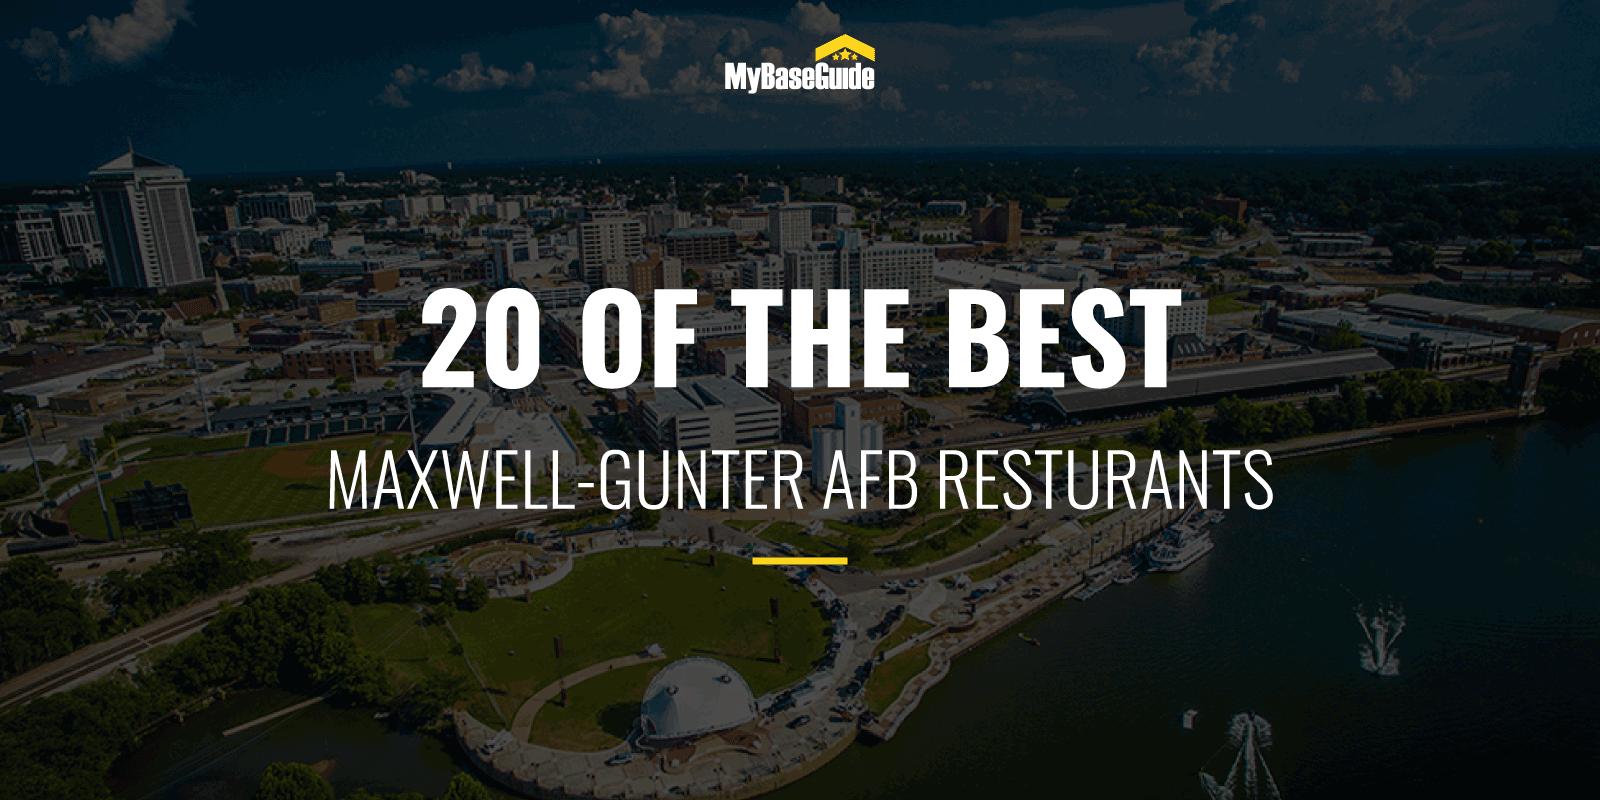 20 of the Best Maxwell-Gunter AFB Restaurants